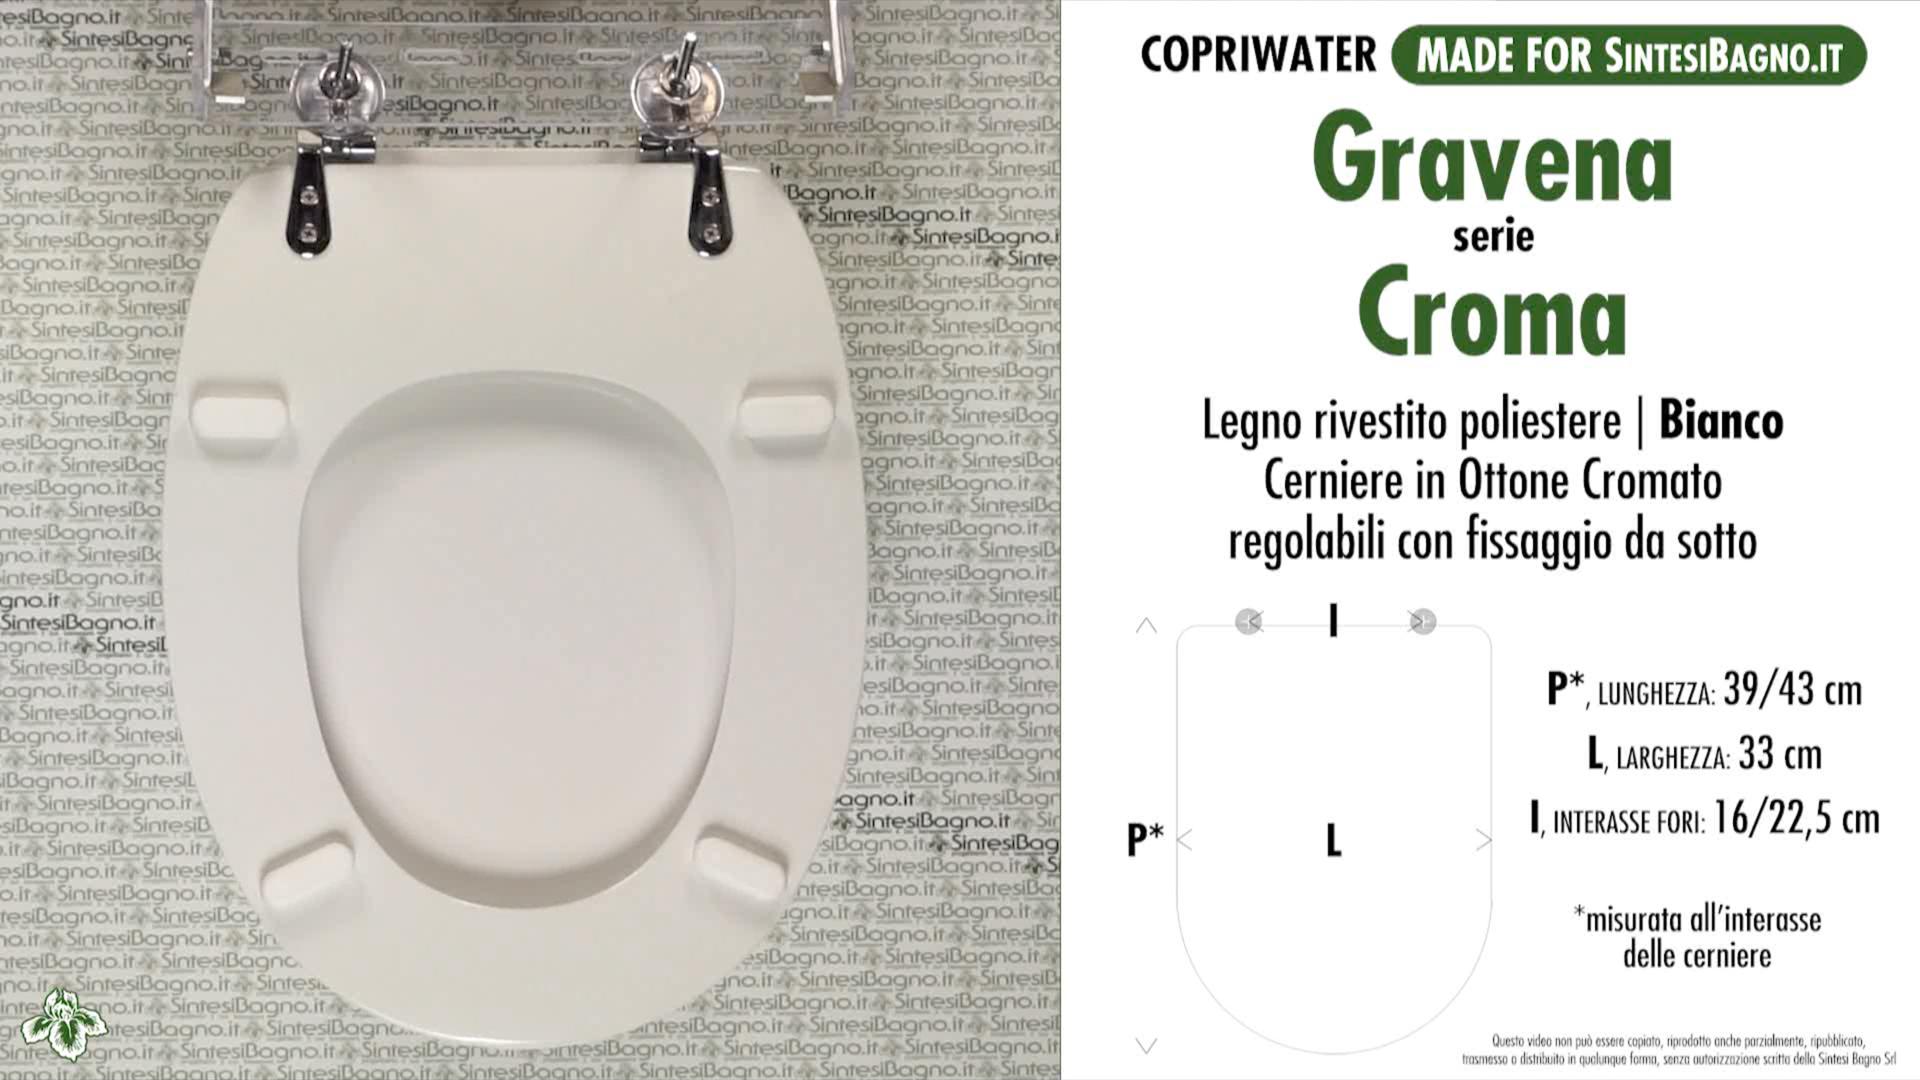 SCHEDA TECNICA MISURE copriwater GRAVENA CONNY